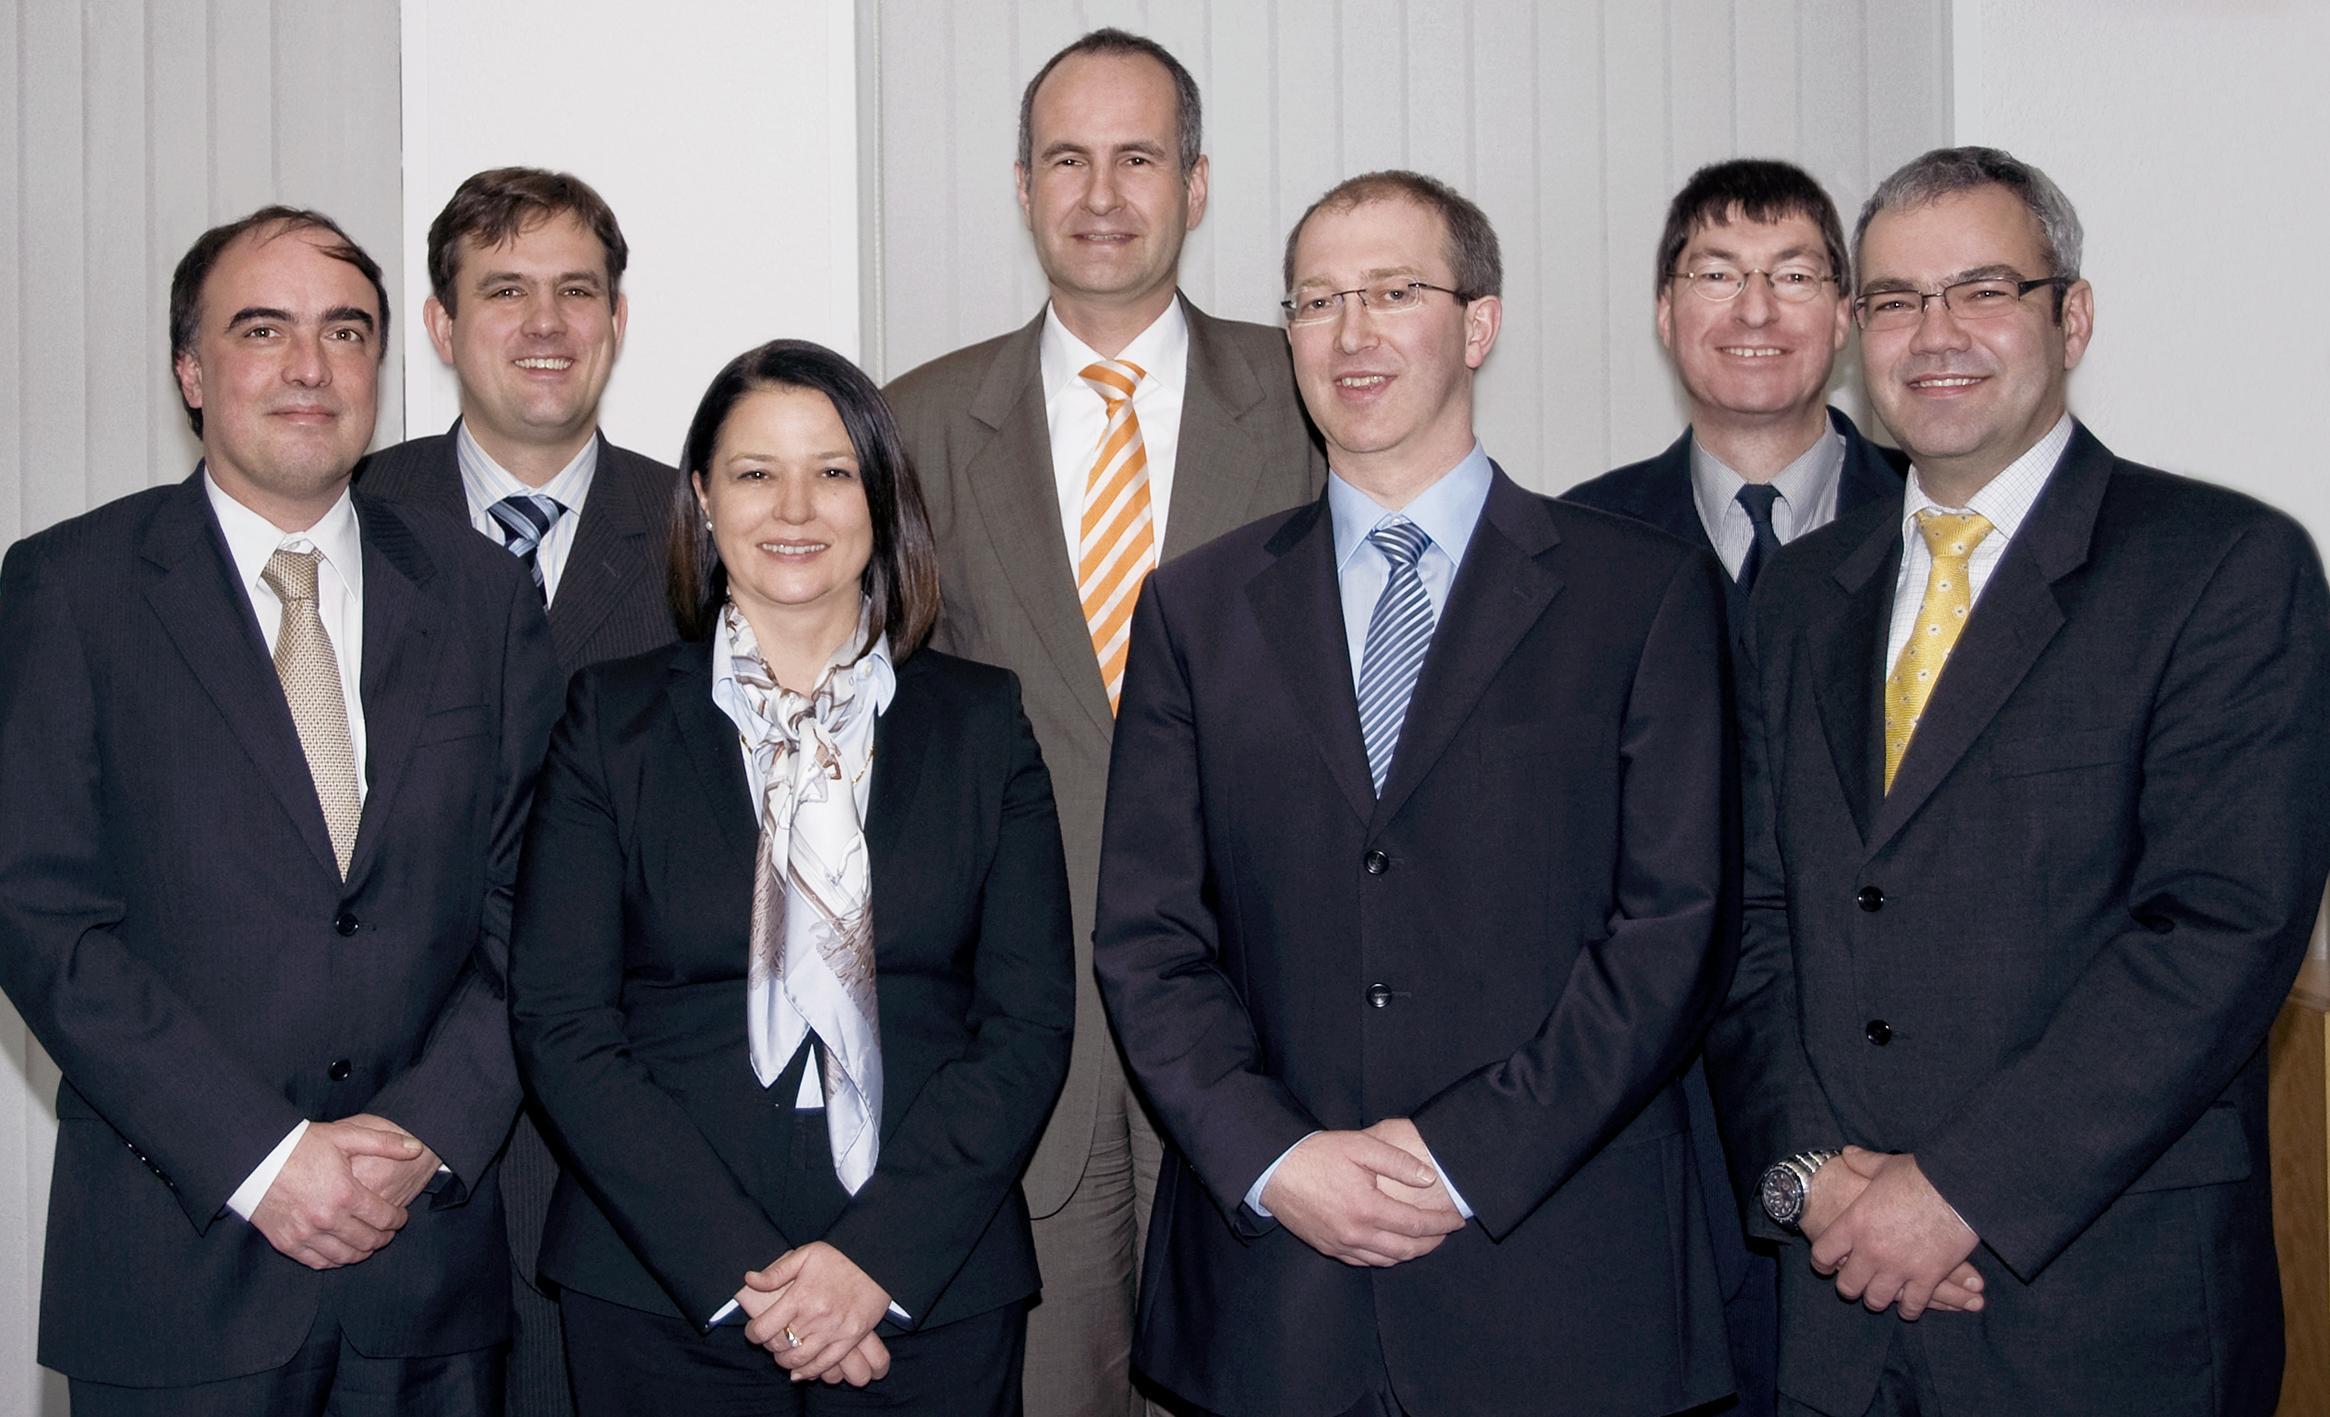 DEM RoundTable Berlin Gruppenfoto